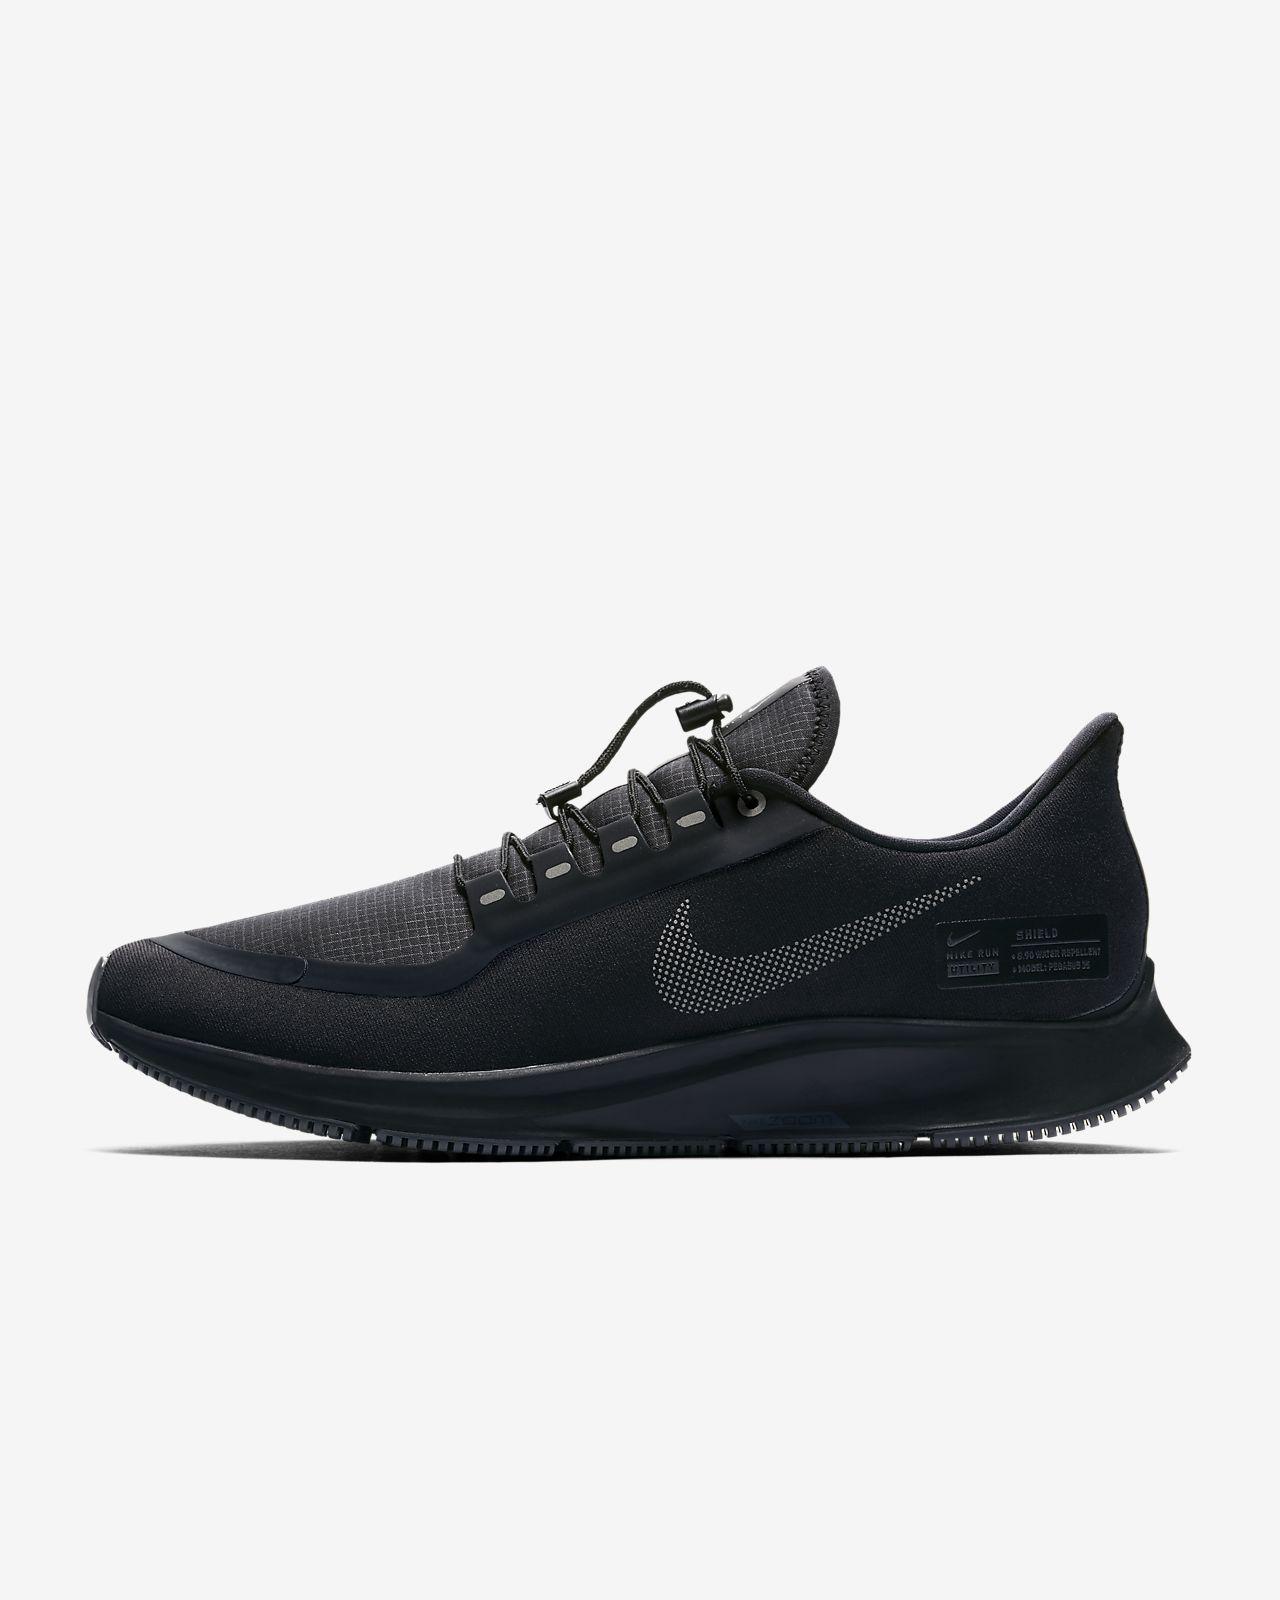 classic fit e2cf8 5116b ... Męskie buty do biegania Nike Air Zoom Pegasus 35 Shield Water-Repellent